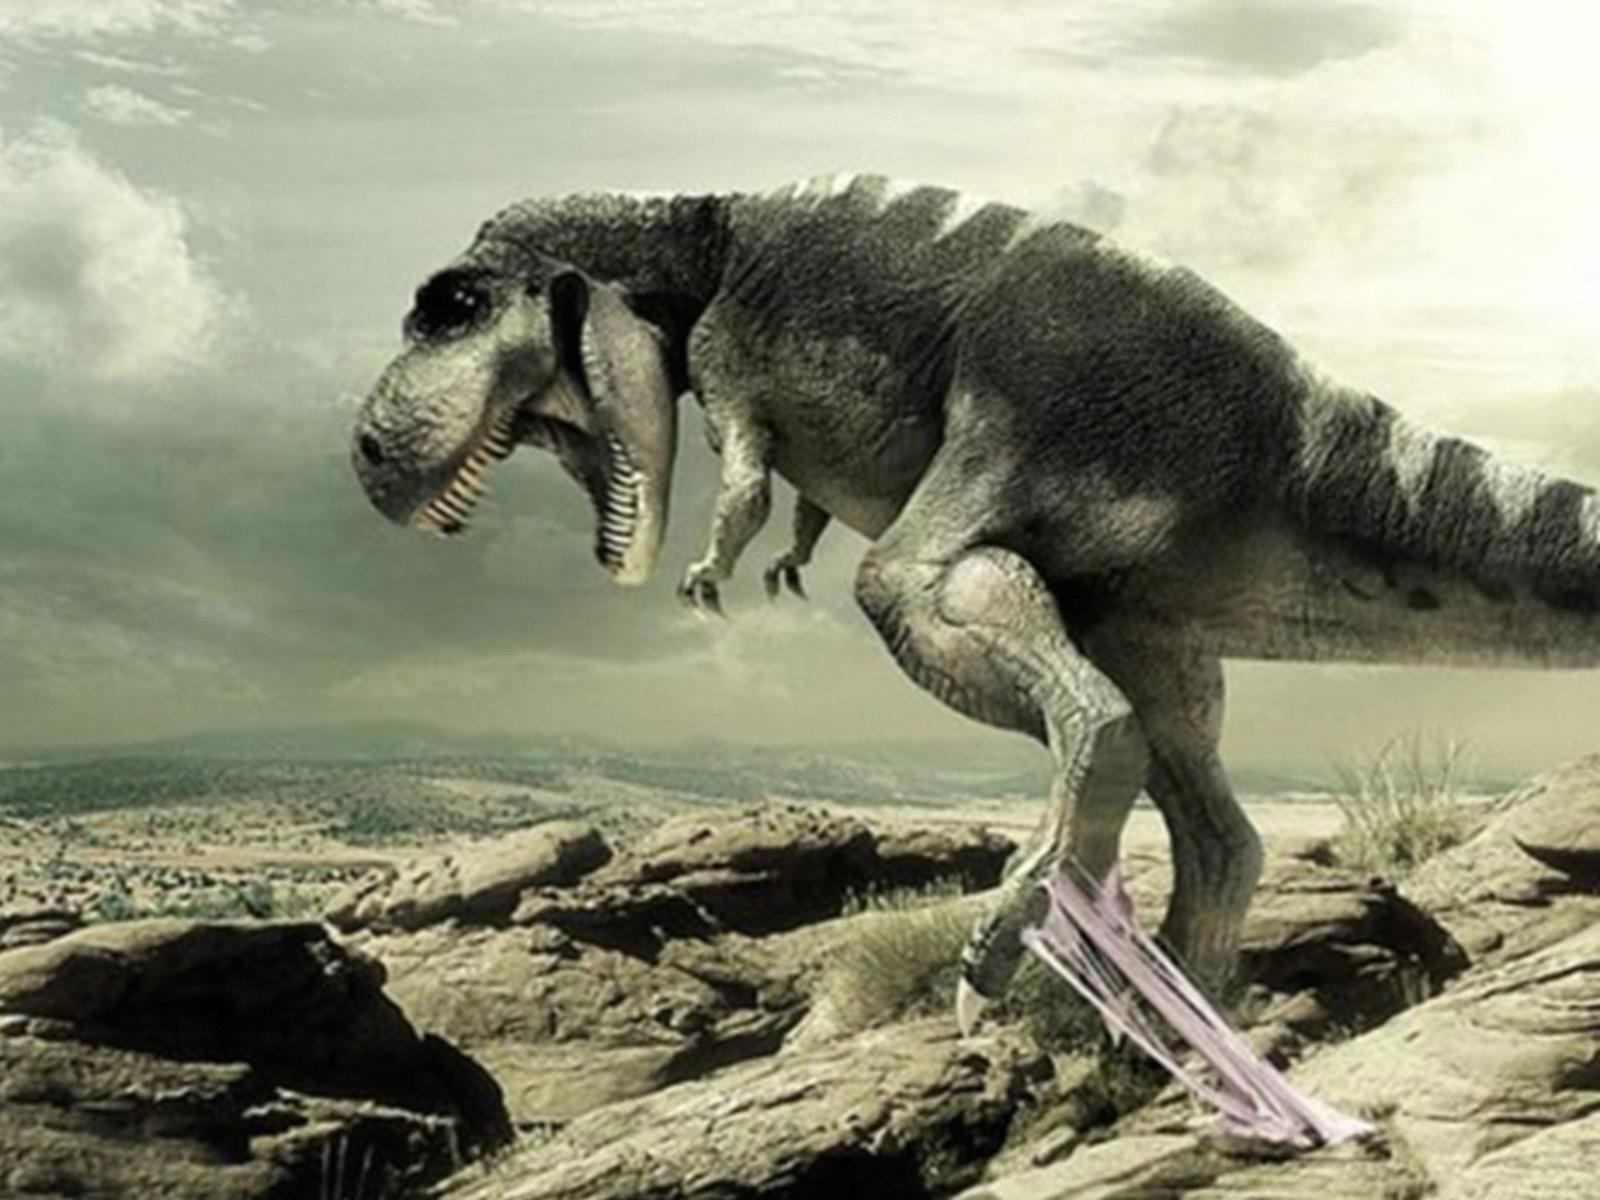 Dinosaur High Res Wallpaper Wollpopor